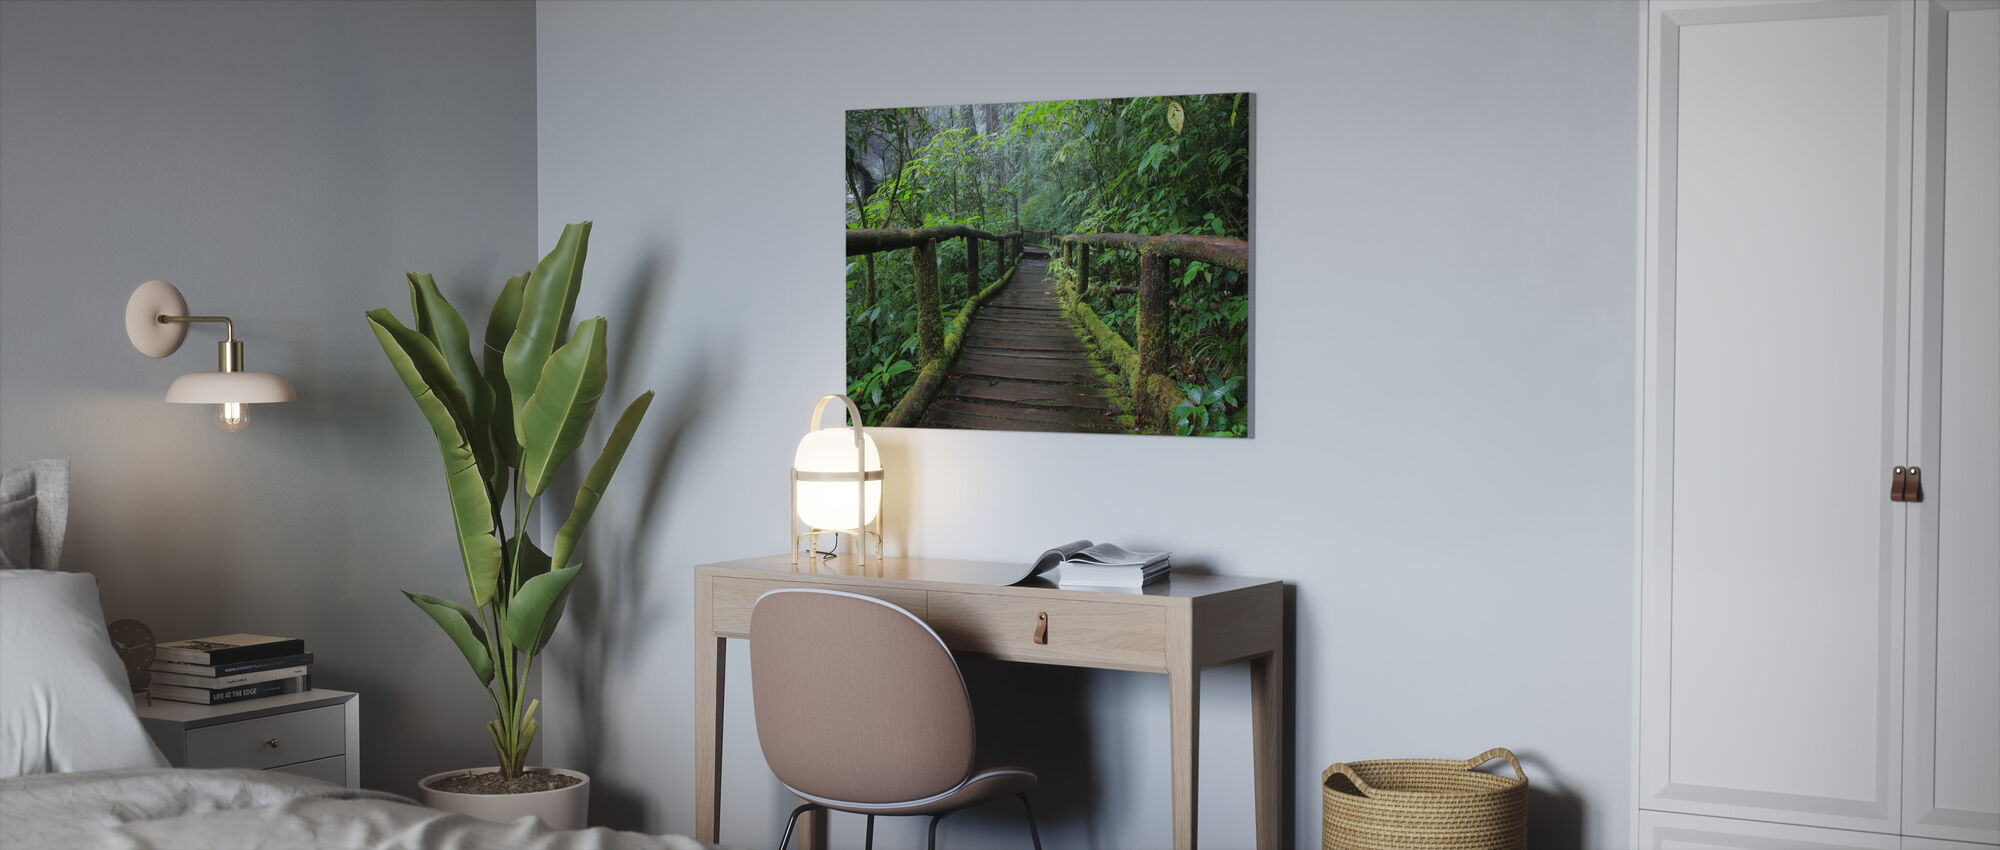 Mooie Brug in Thailand - Canvas print - Kantoor